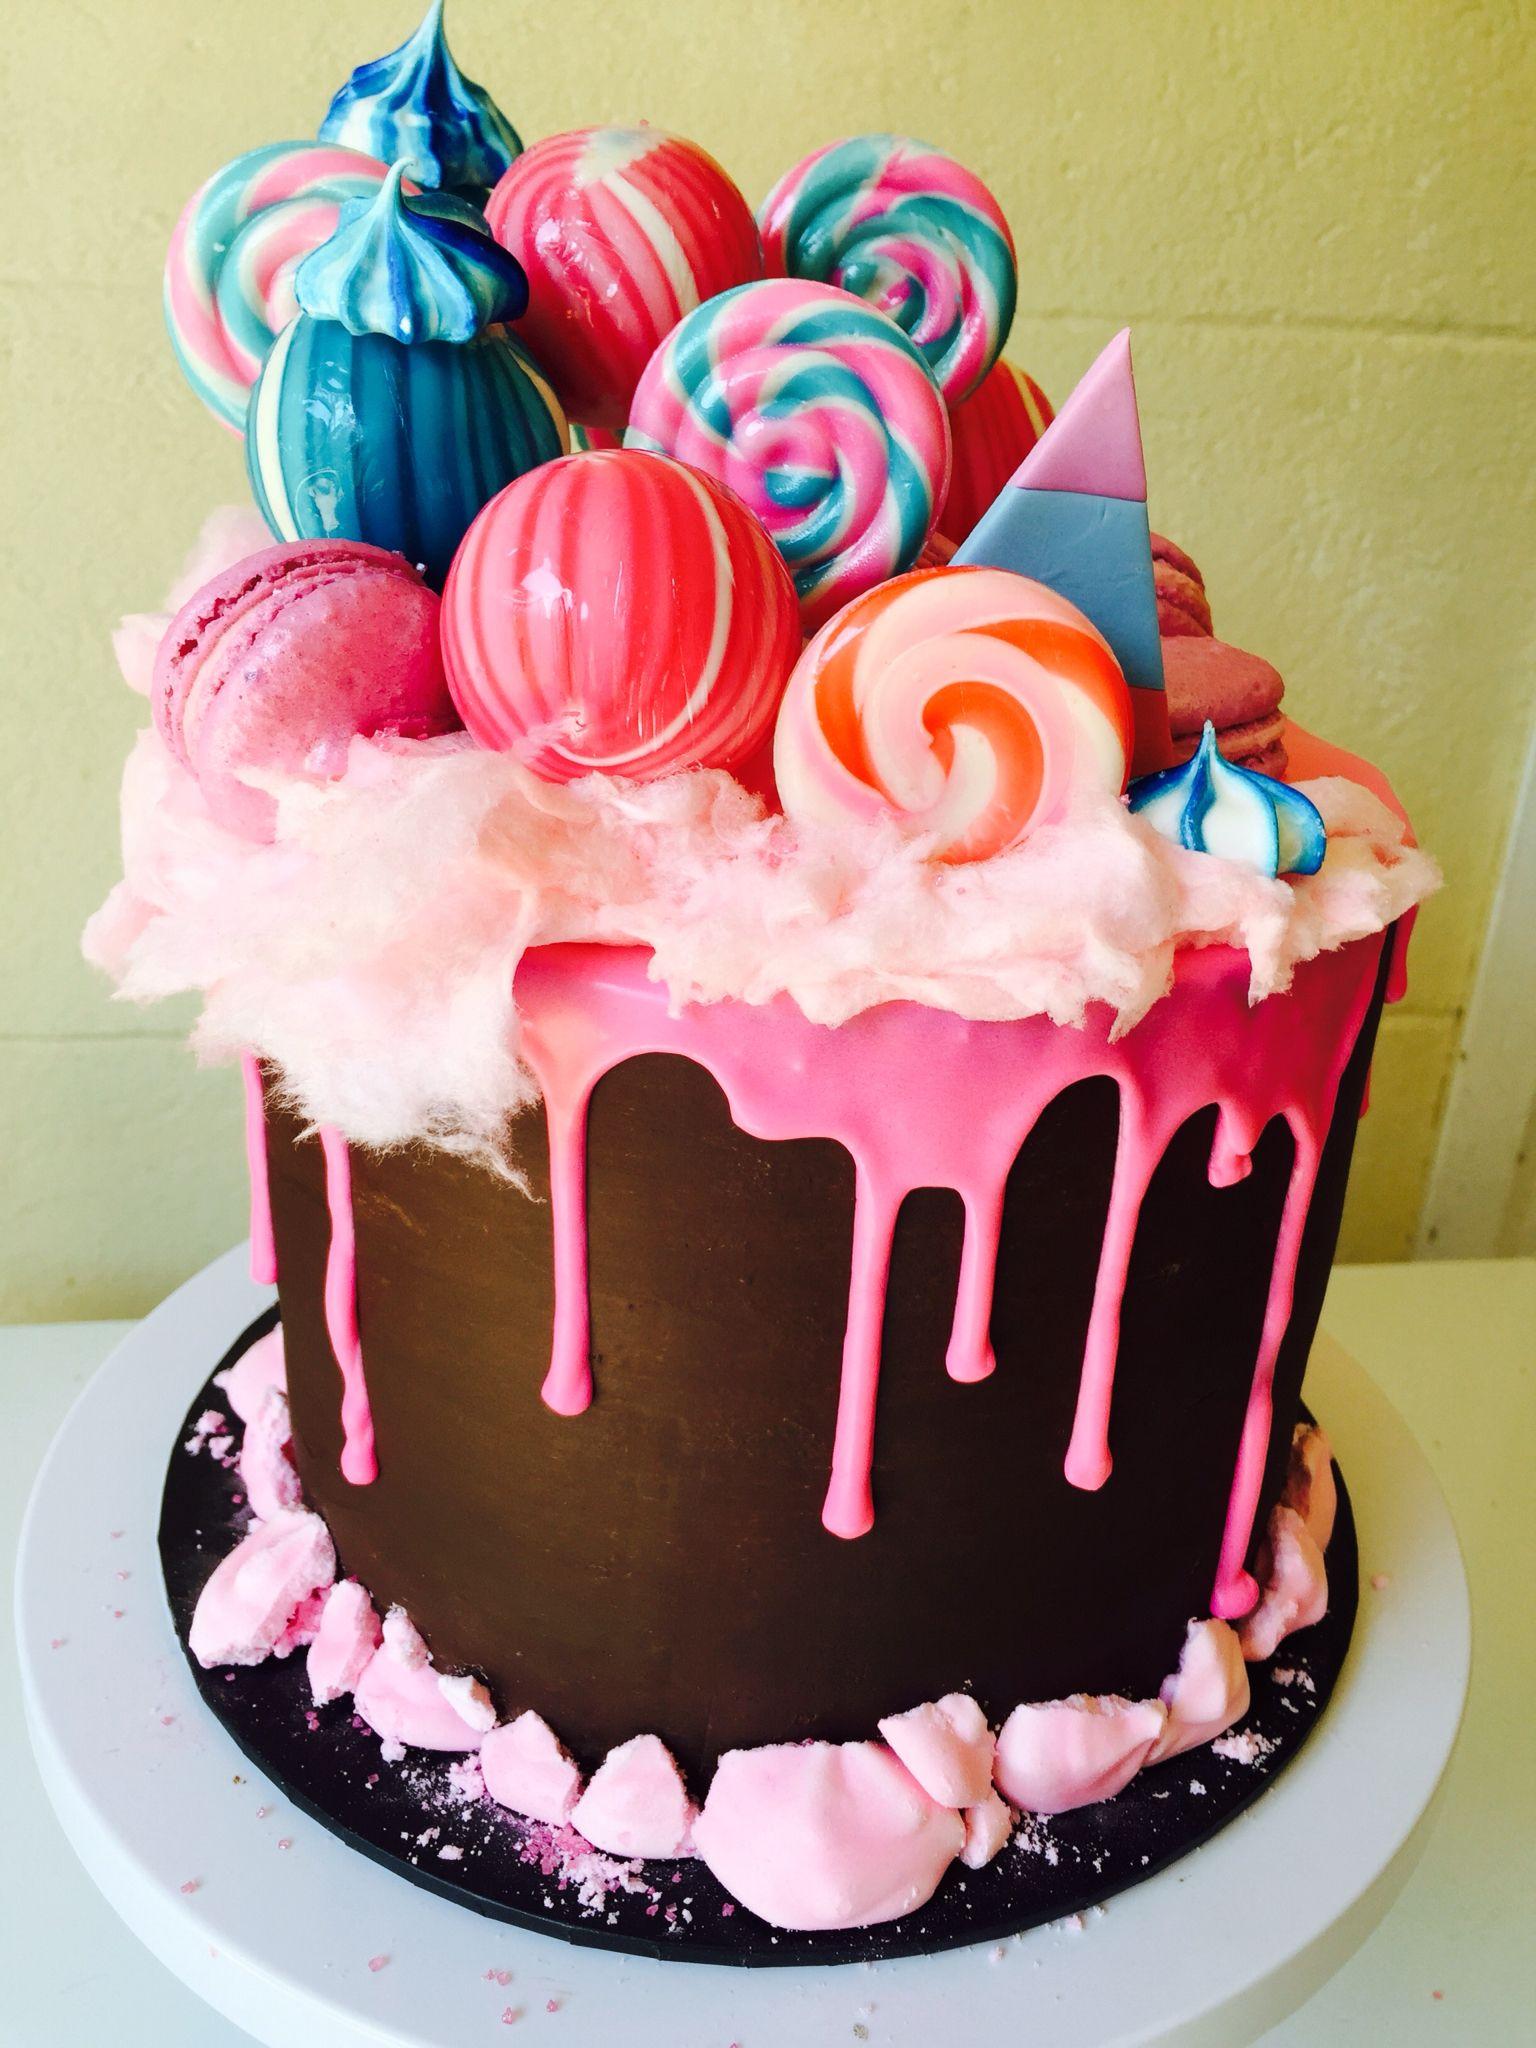 Katherine Sabbath Inspired Funfair Meets Candy Crush Cake